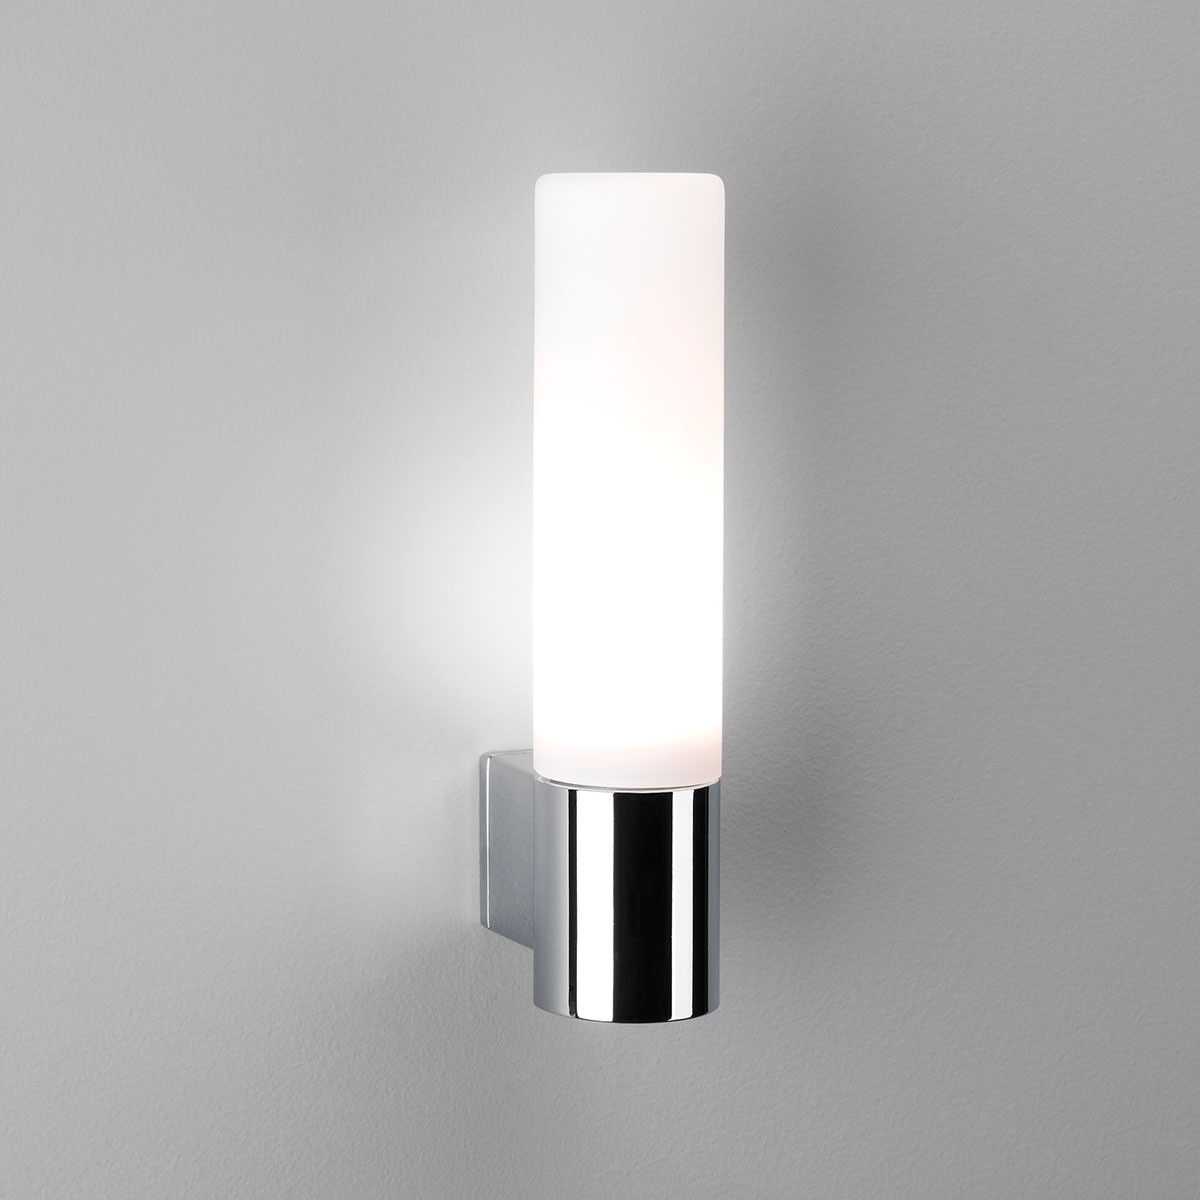 Astro Bari Polished Chrome Bathroom Wall Light At Uk Electrical Supplies